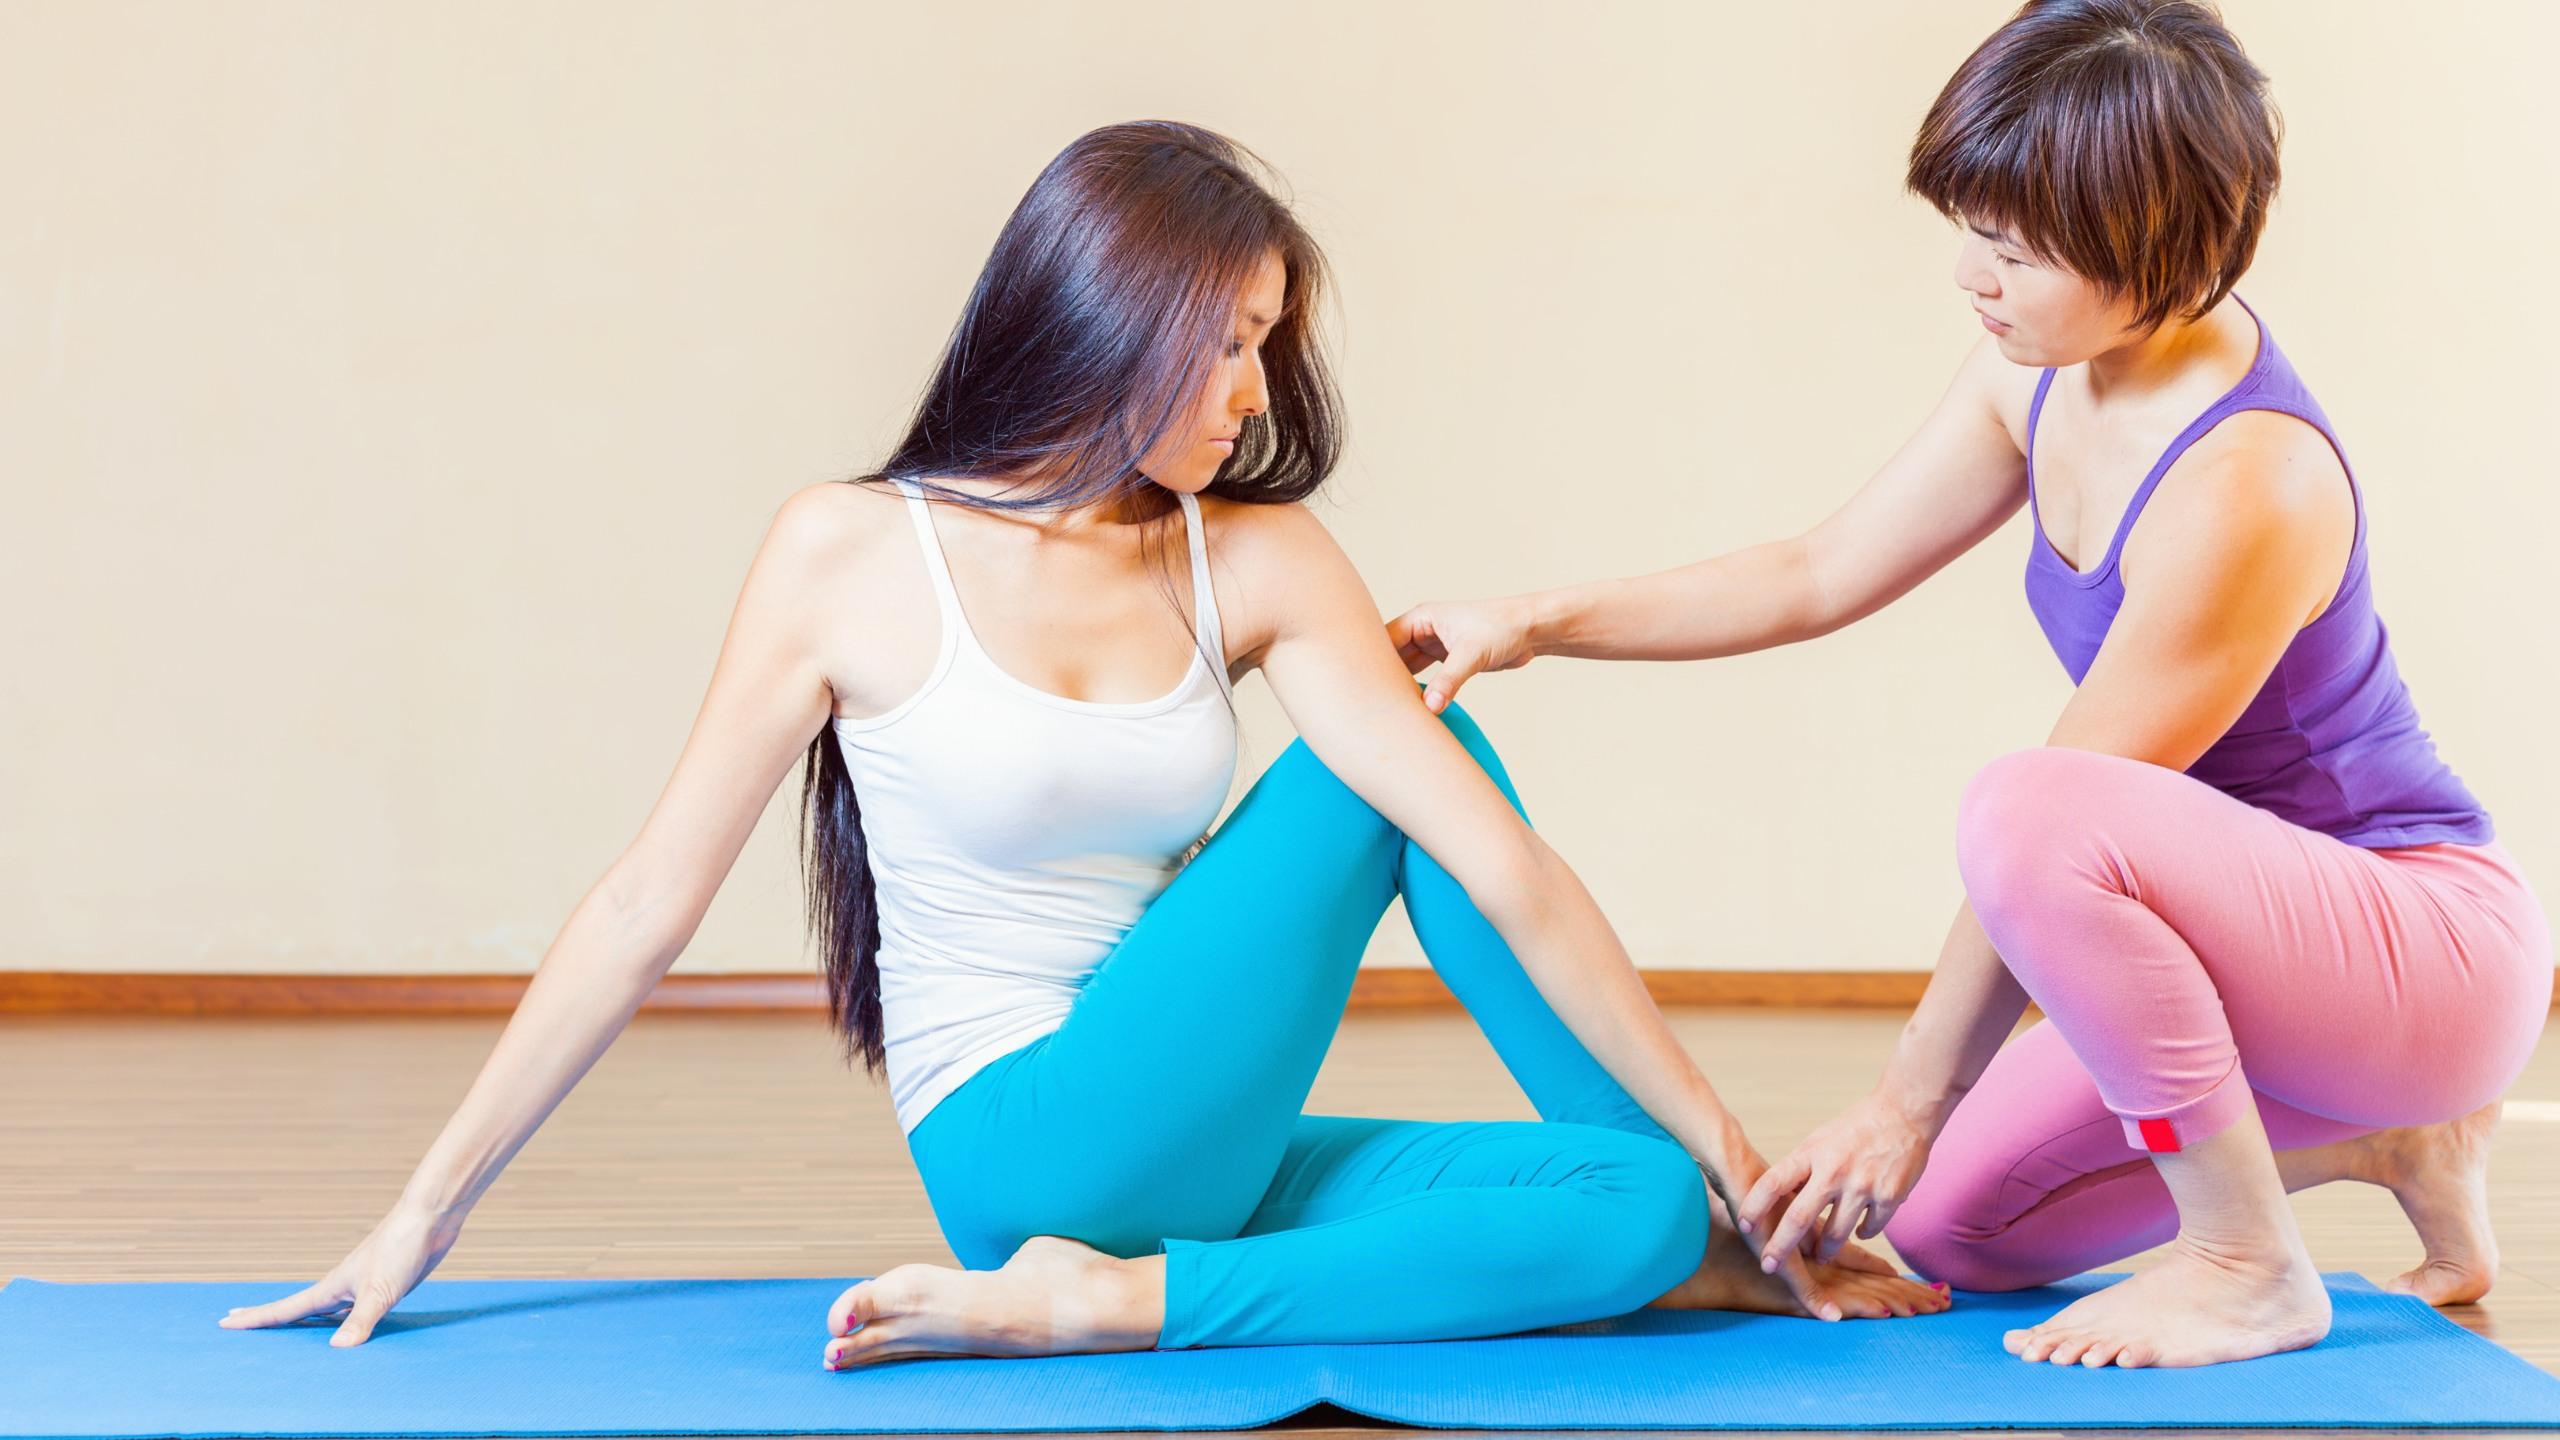 Should I Adjust Students in Yoga Class?